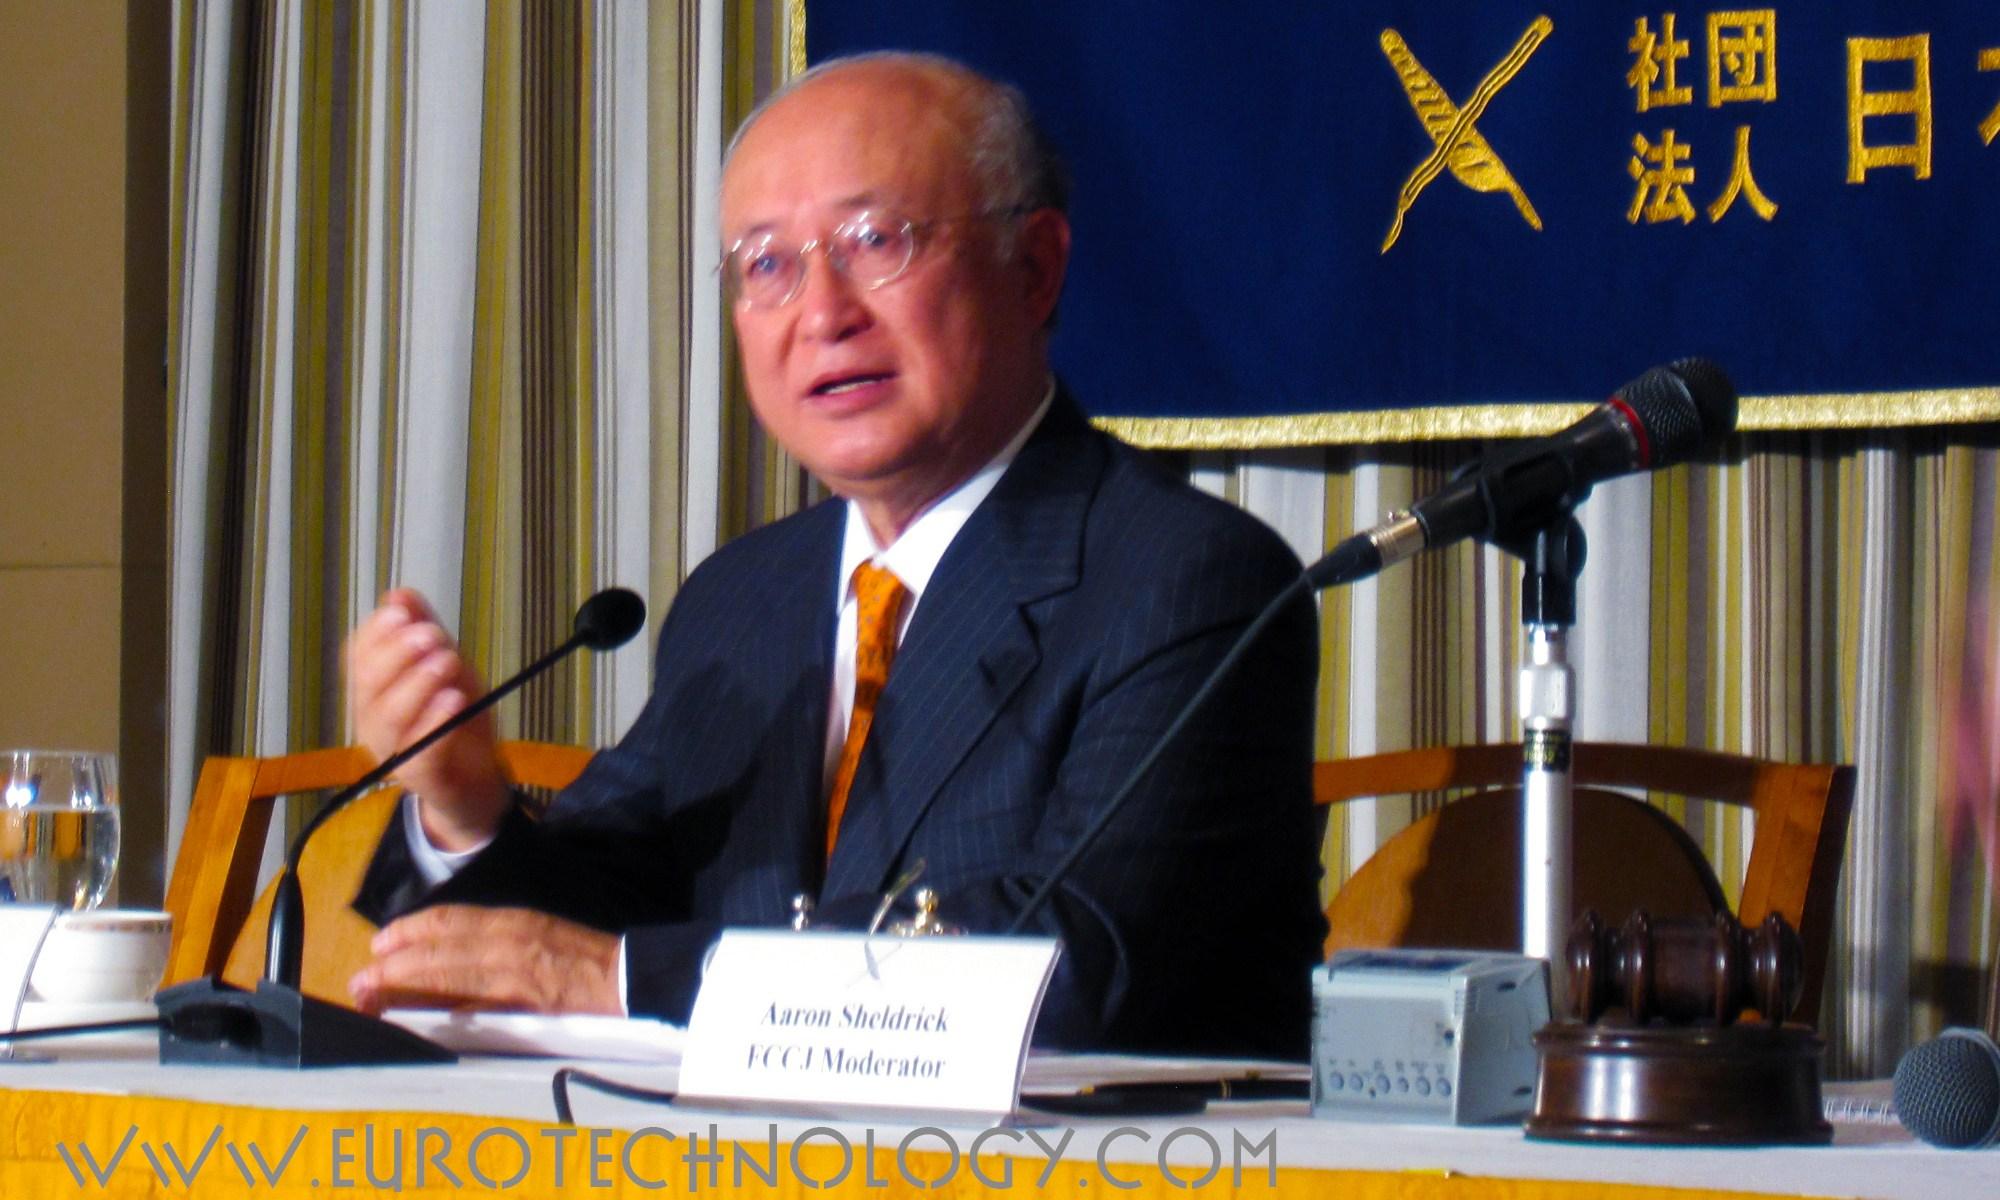 Mr Yukiya Amano (天野之弥), Director General of the International Atomic Energy Agency (IAEA)